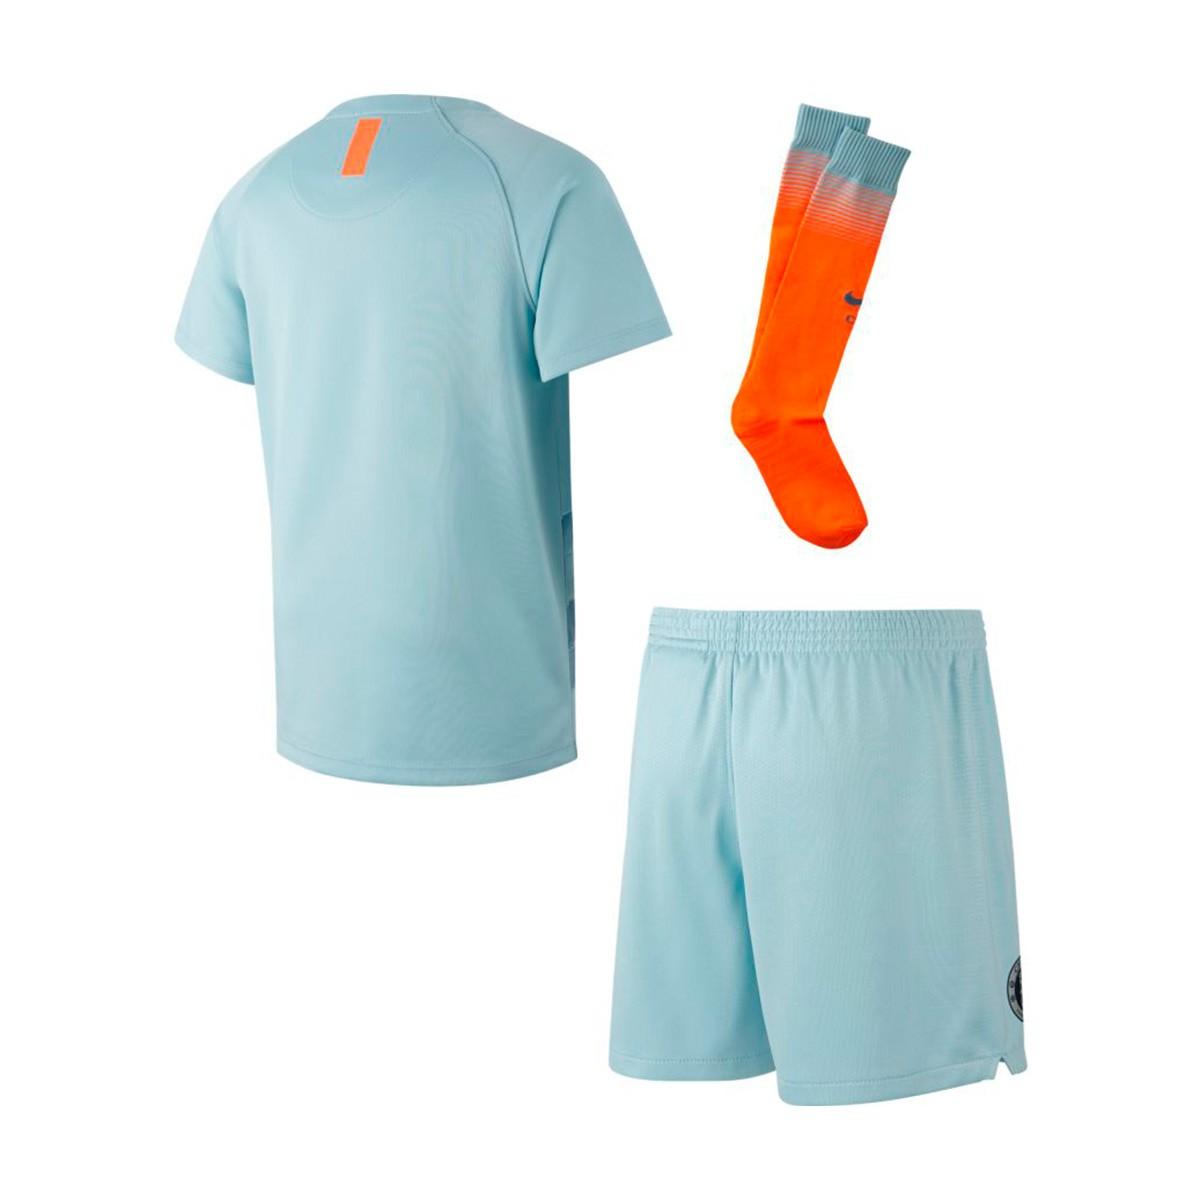 Kit Nike Kids Chelsea FC 2018-2019 Third Ocean bliss-Metallic silver ... 10a1bbf95adac